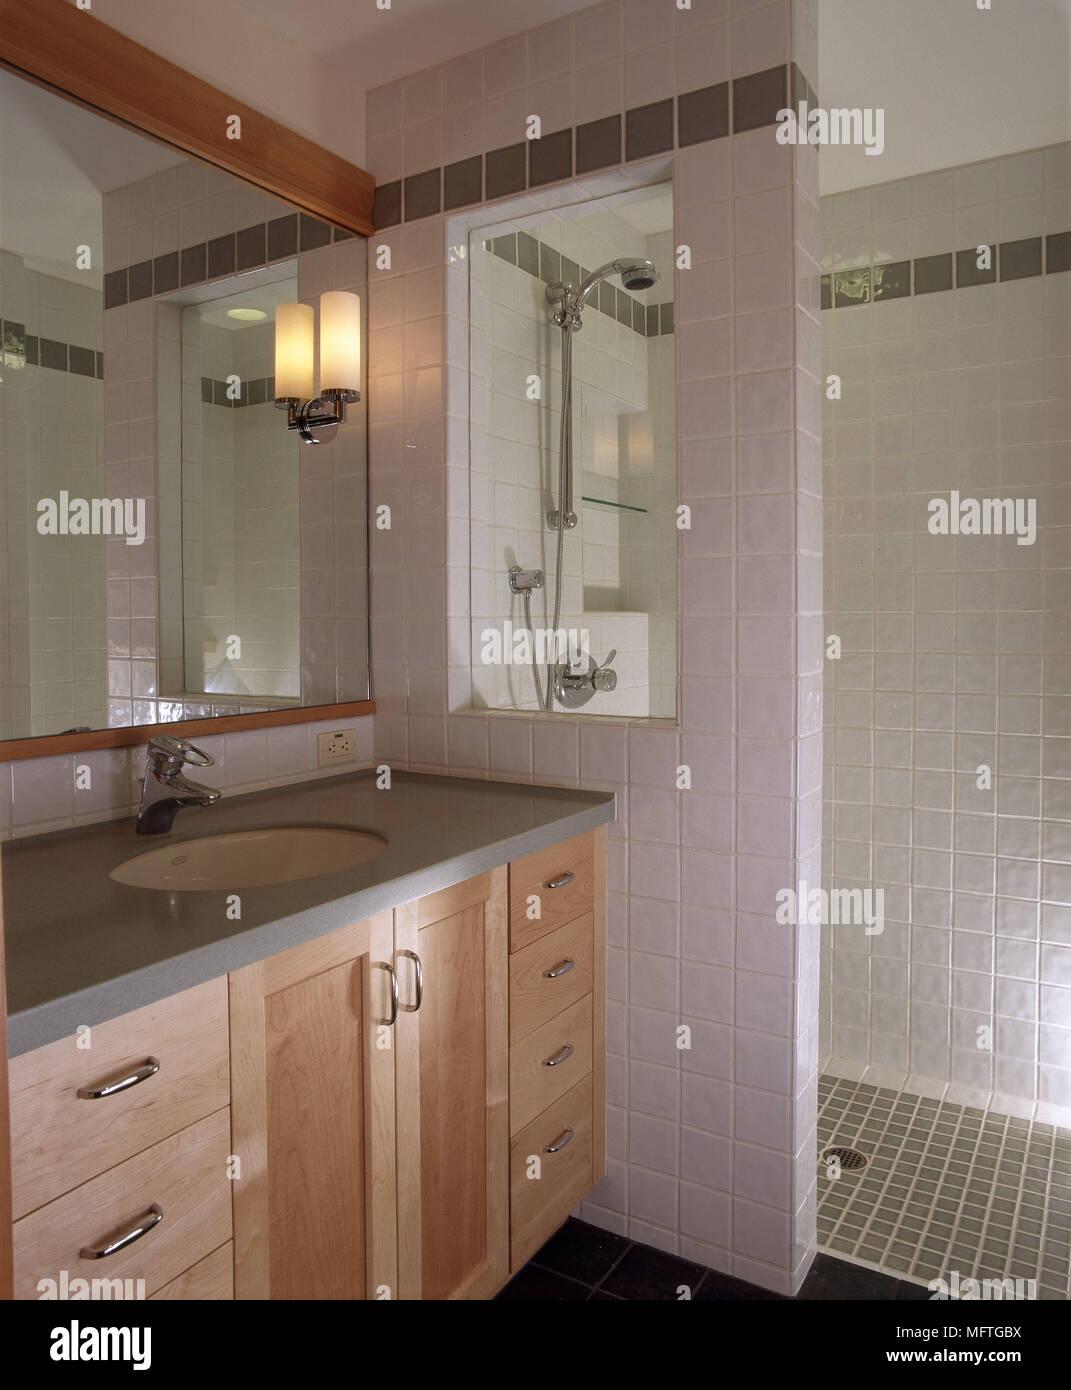 Modern pink bathroom washbasin set in cupboard unit walk in shower interiors bathrooms showers sinks tiling built in cupboards storage & Modern pink bathroom washbasin set in cupboard unit walk in shower ...